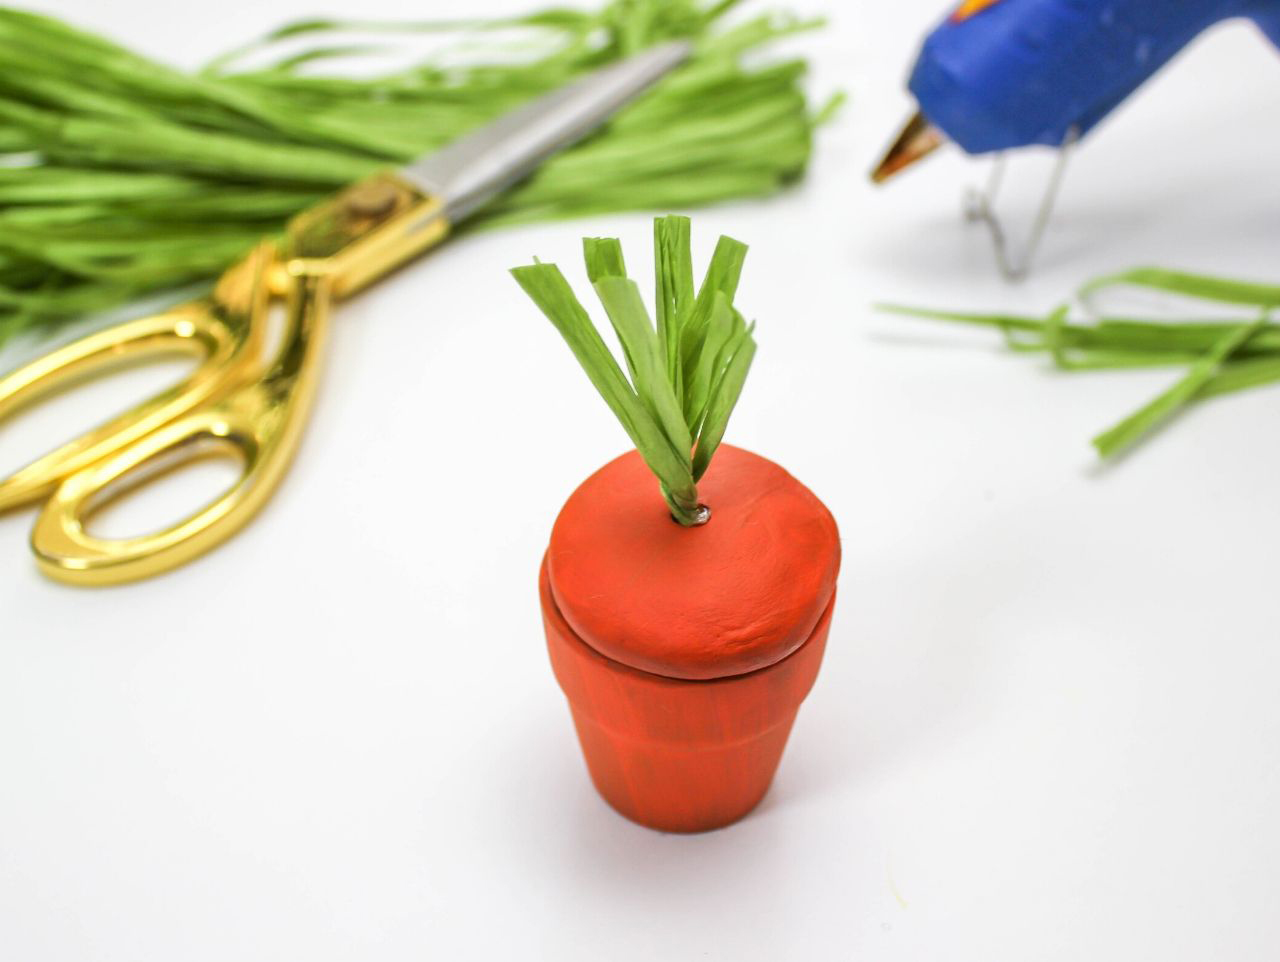 Easter craft, DIY Carrot Pot Favor, carrot, favor, carrot favor, terra cotta pot favor, Easter tablescape, DIY Easter craft, craft tutorial, Easter Craft Tutorial, carrot favor, Just Add Confetti